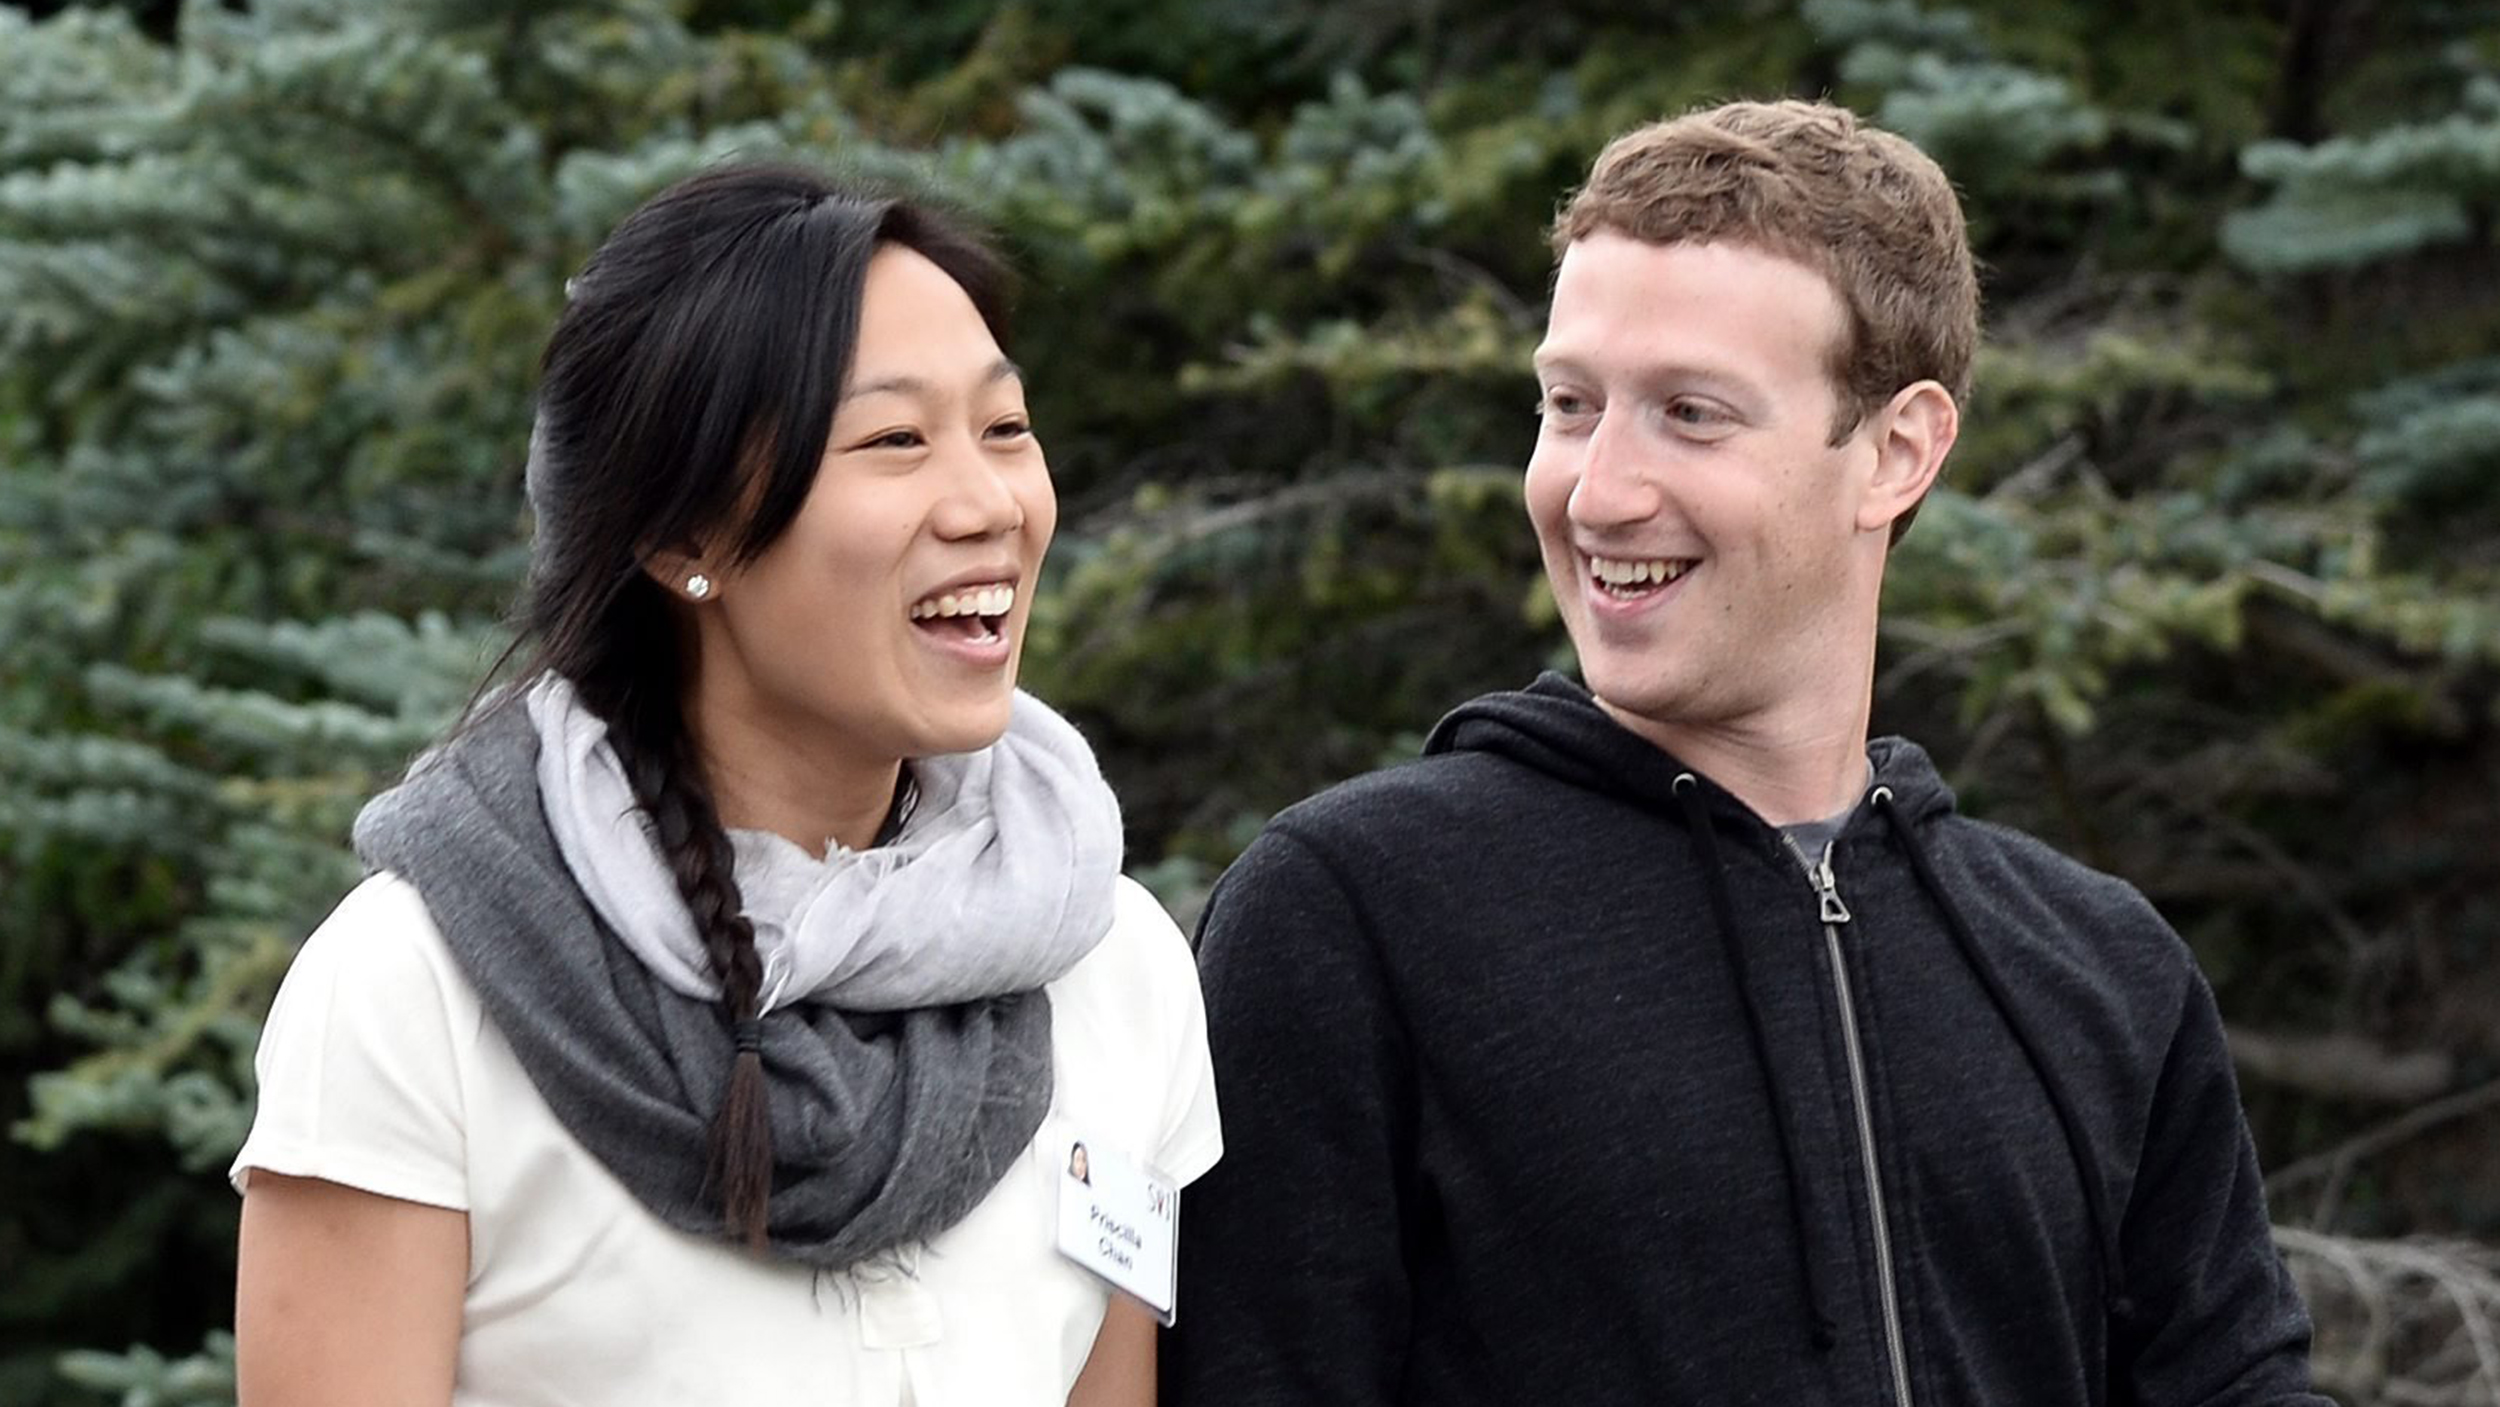 Mark Zuckerberg And Priscilla Chan Are Expecting A Baby